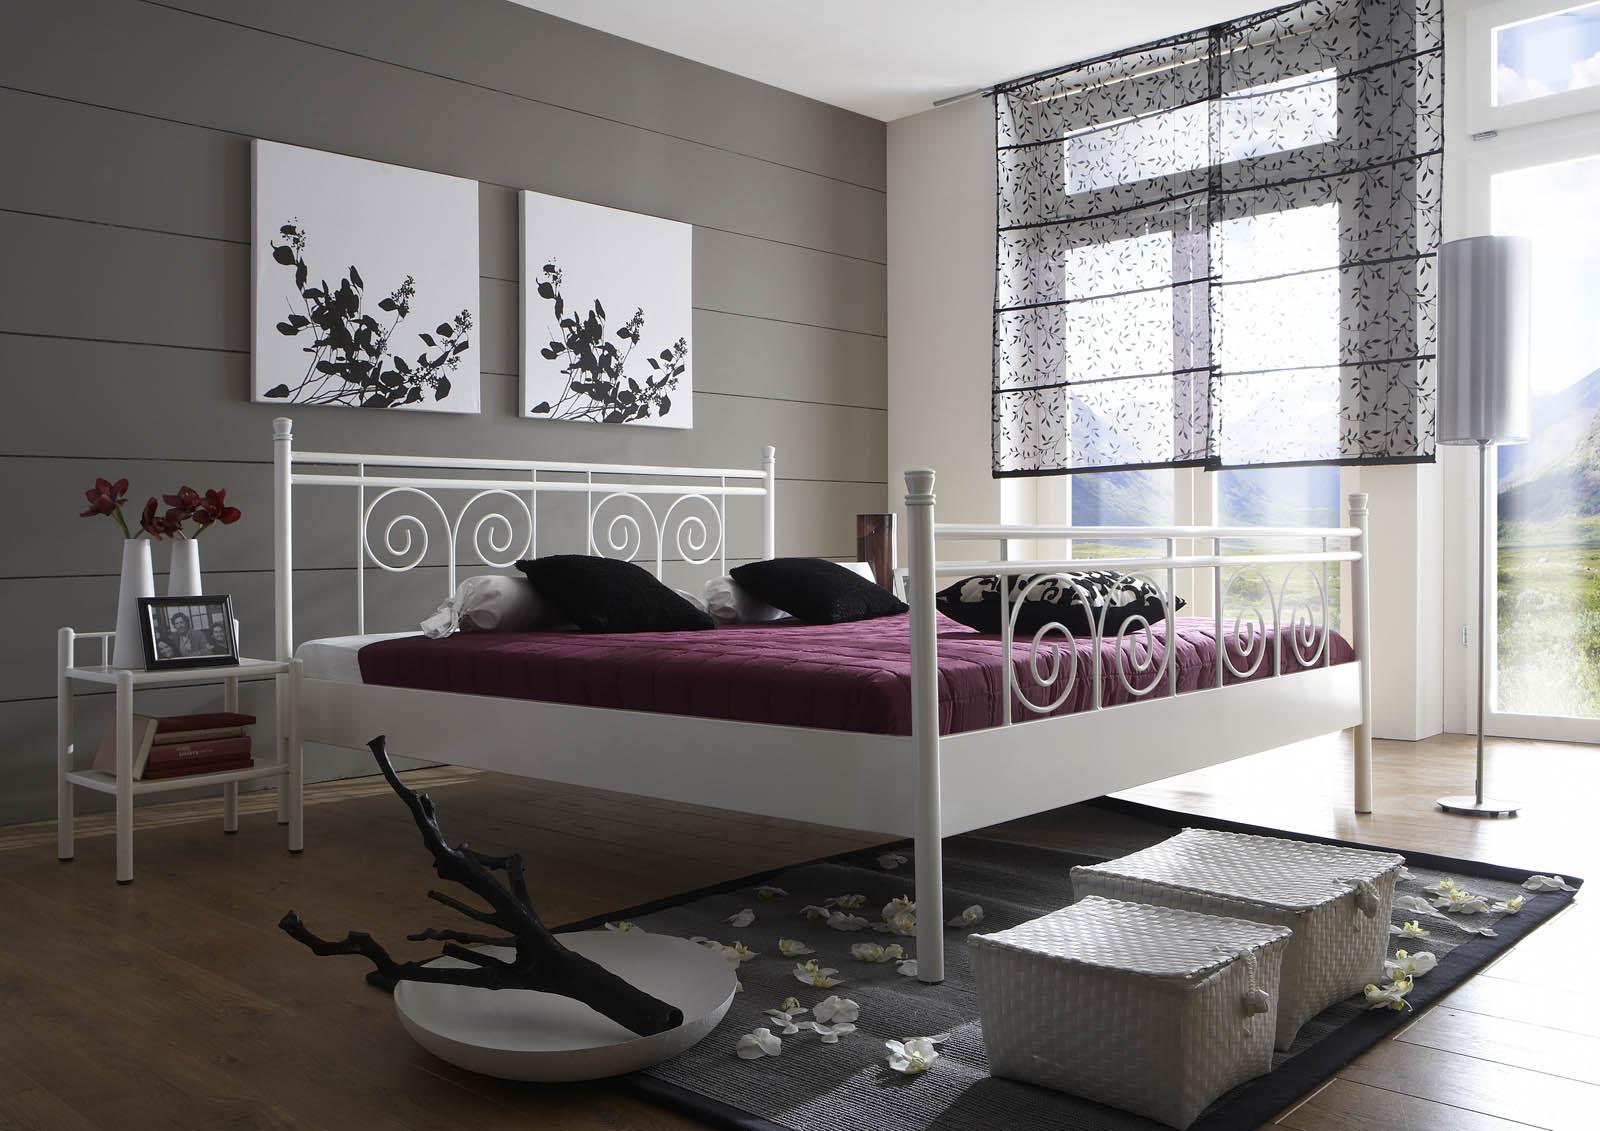 sam metallbett wei 140 x 200 cm rhodos g nstig. Black Bedroom Furniture Sets. Home Design Ideas